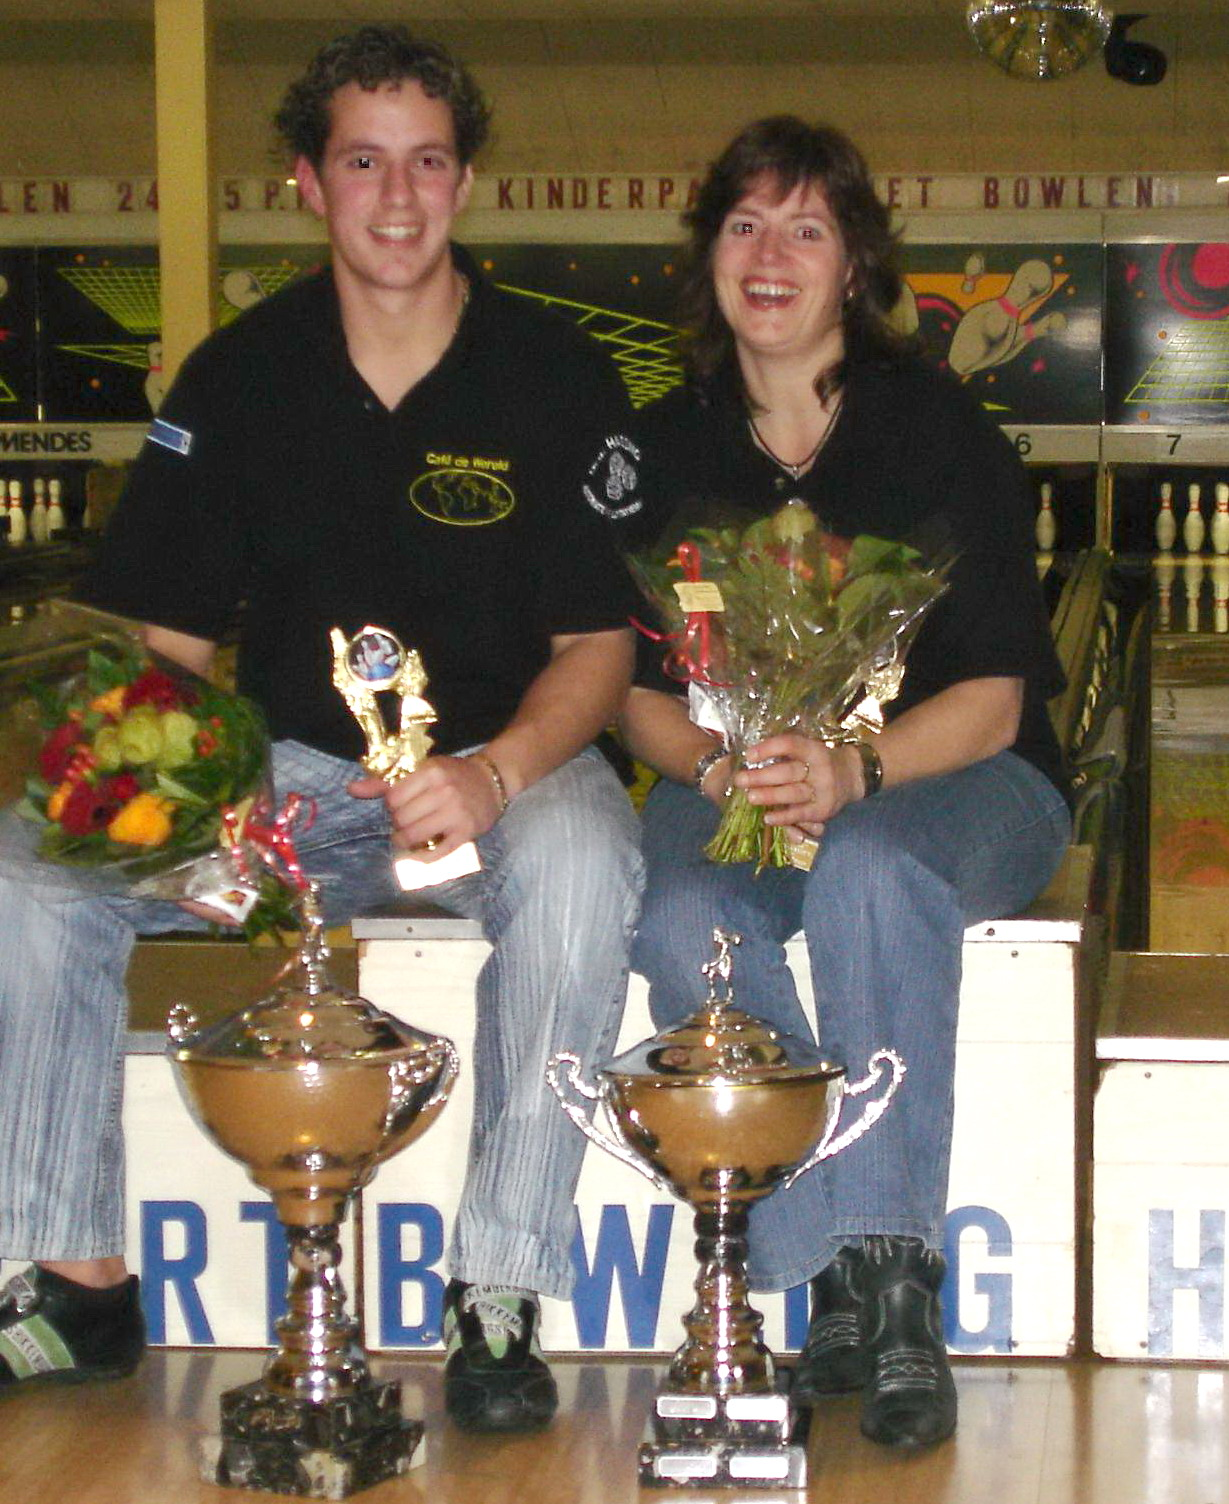 http://www.bowlingverenigingheiloo.nl/fotos_verhalen/foto's/2006_0000-Ver.kampioenen-Petra-Silvio.jpg